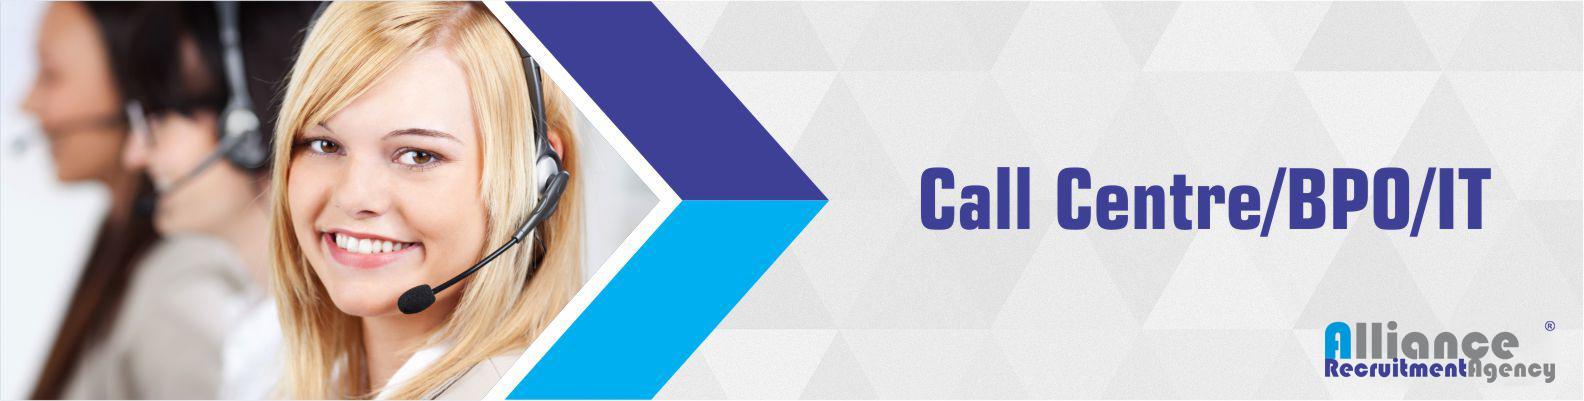 Call center & BPO recruitment